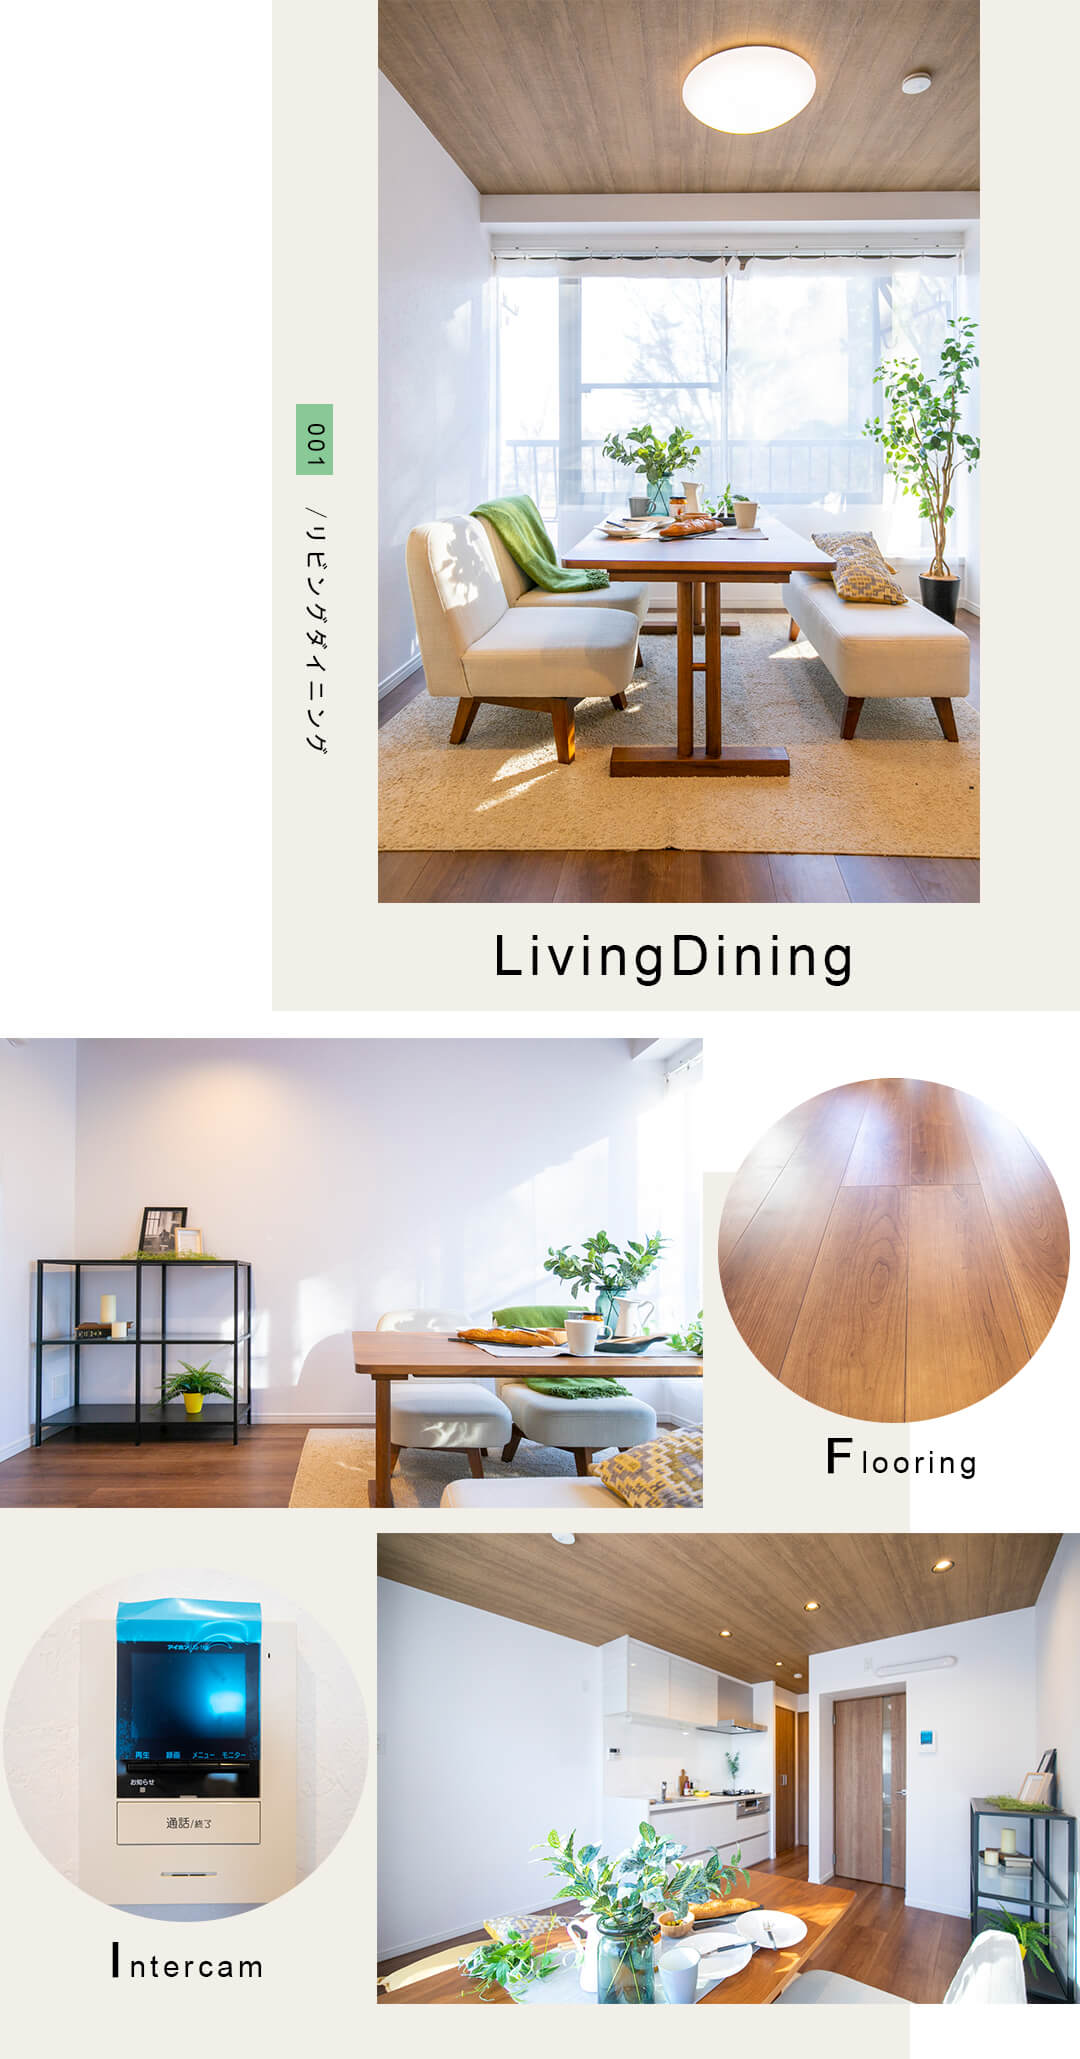 001,LivingDining,リビングダイニング